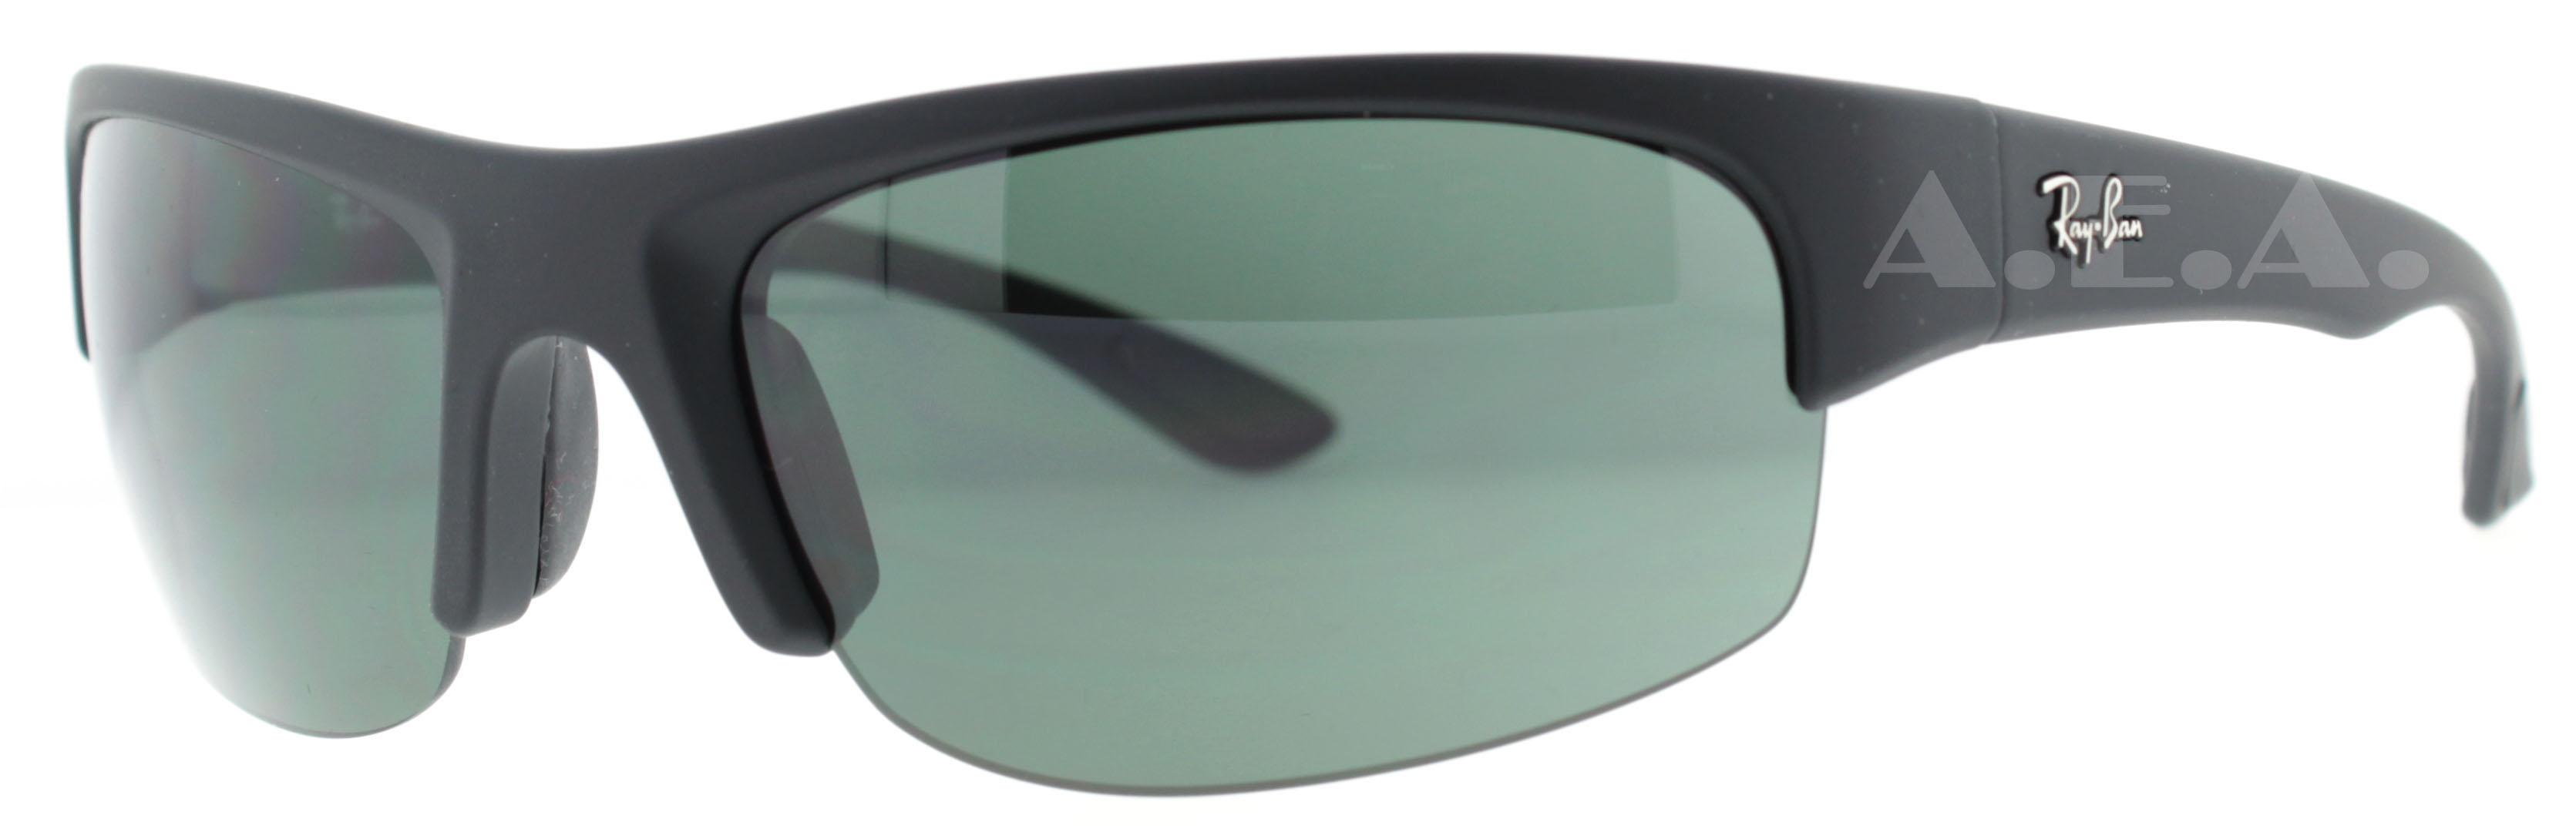 black mirrored ray ban aviators  matte black w/